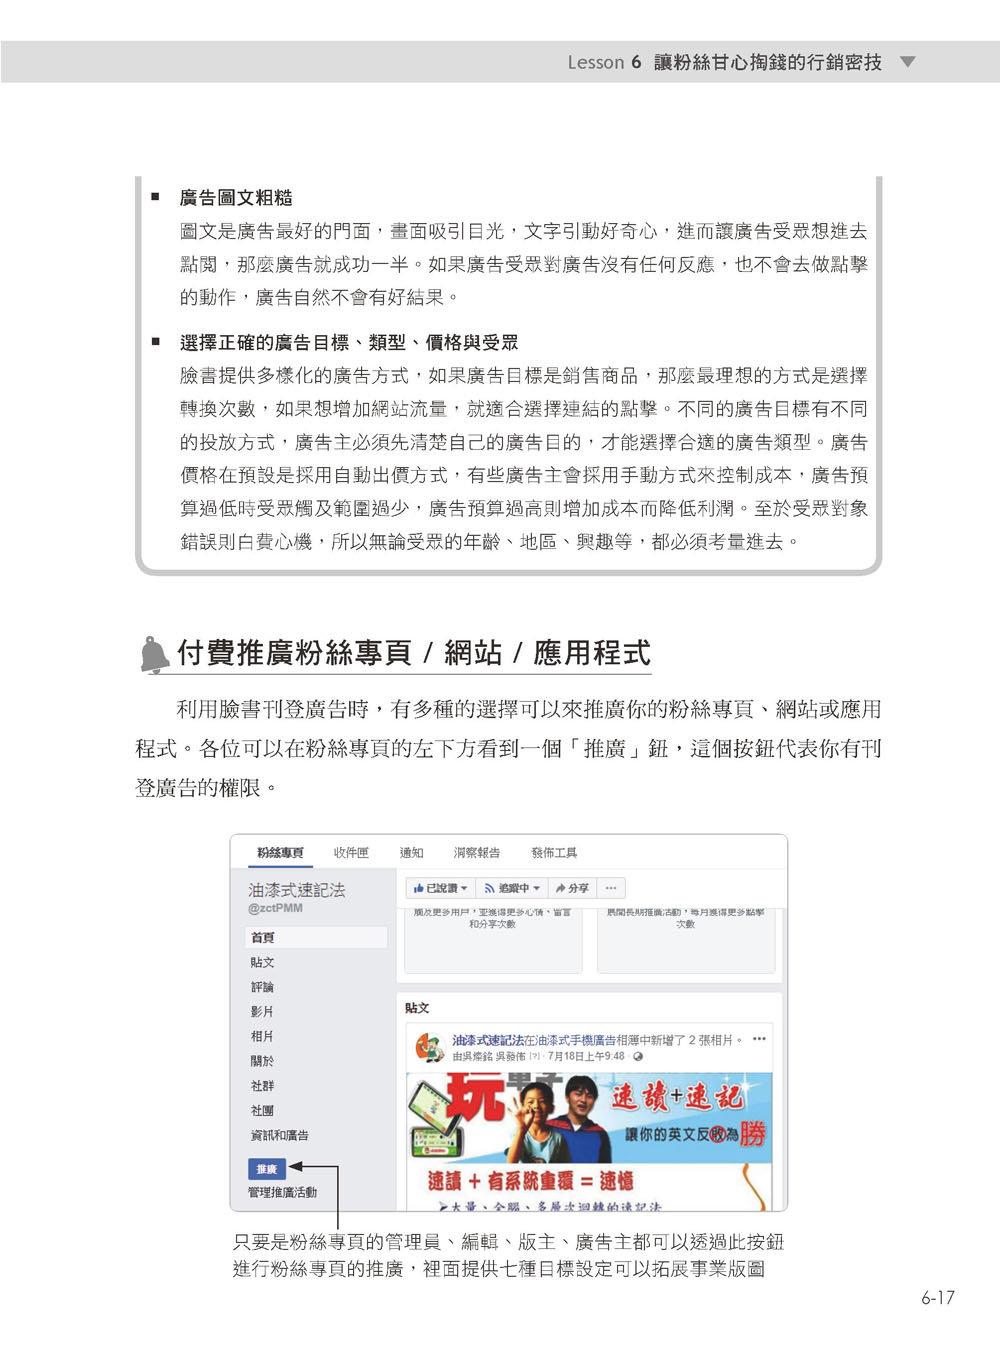 Facebook 互動行銷:社群口碑經營新思路+廣告投放如何有成效,想做好臉書行銷,操作心法就在這!-preview-47